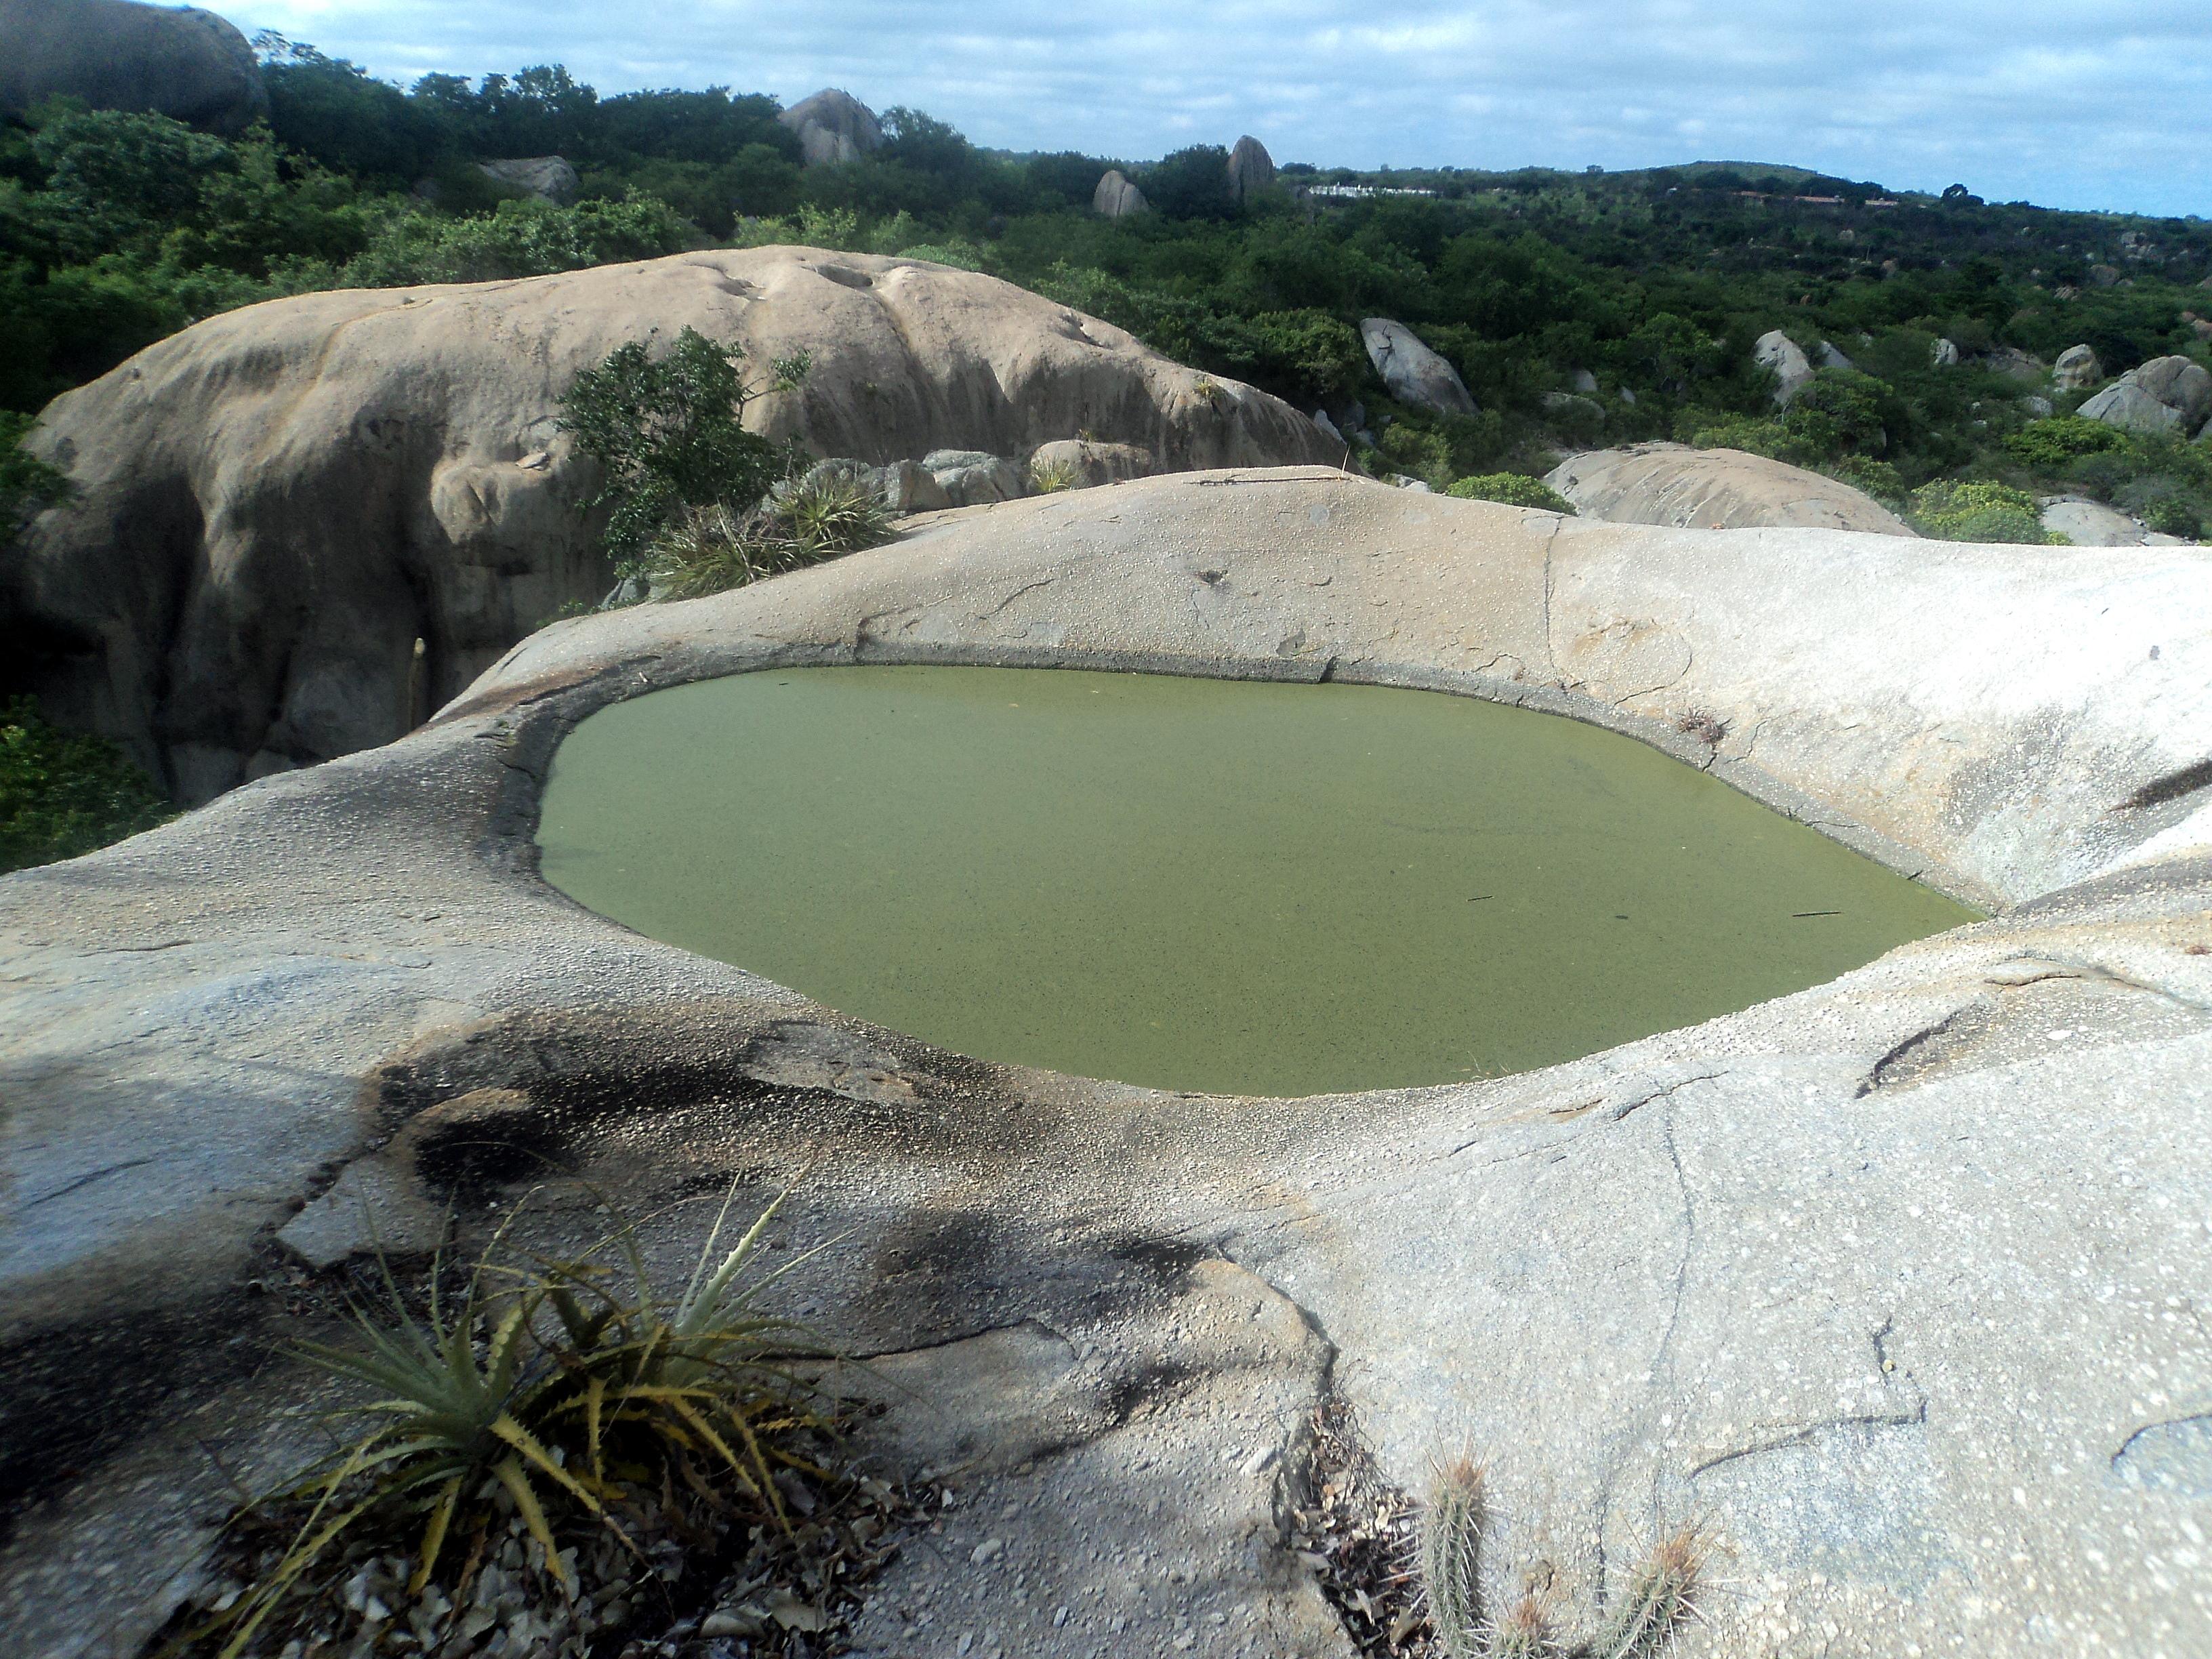 Brejinho Pernambuco fonte: upload.wikimedia.org